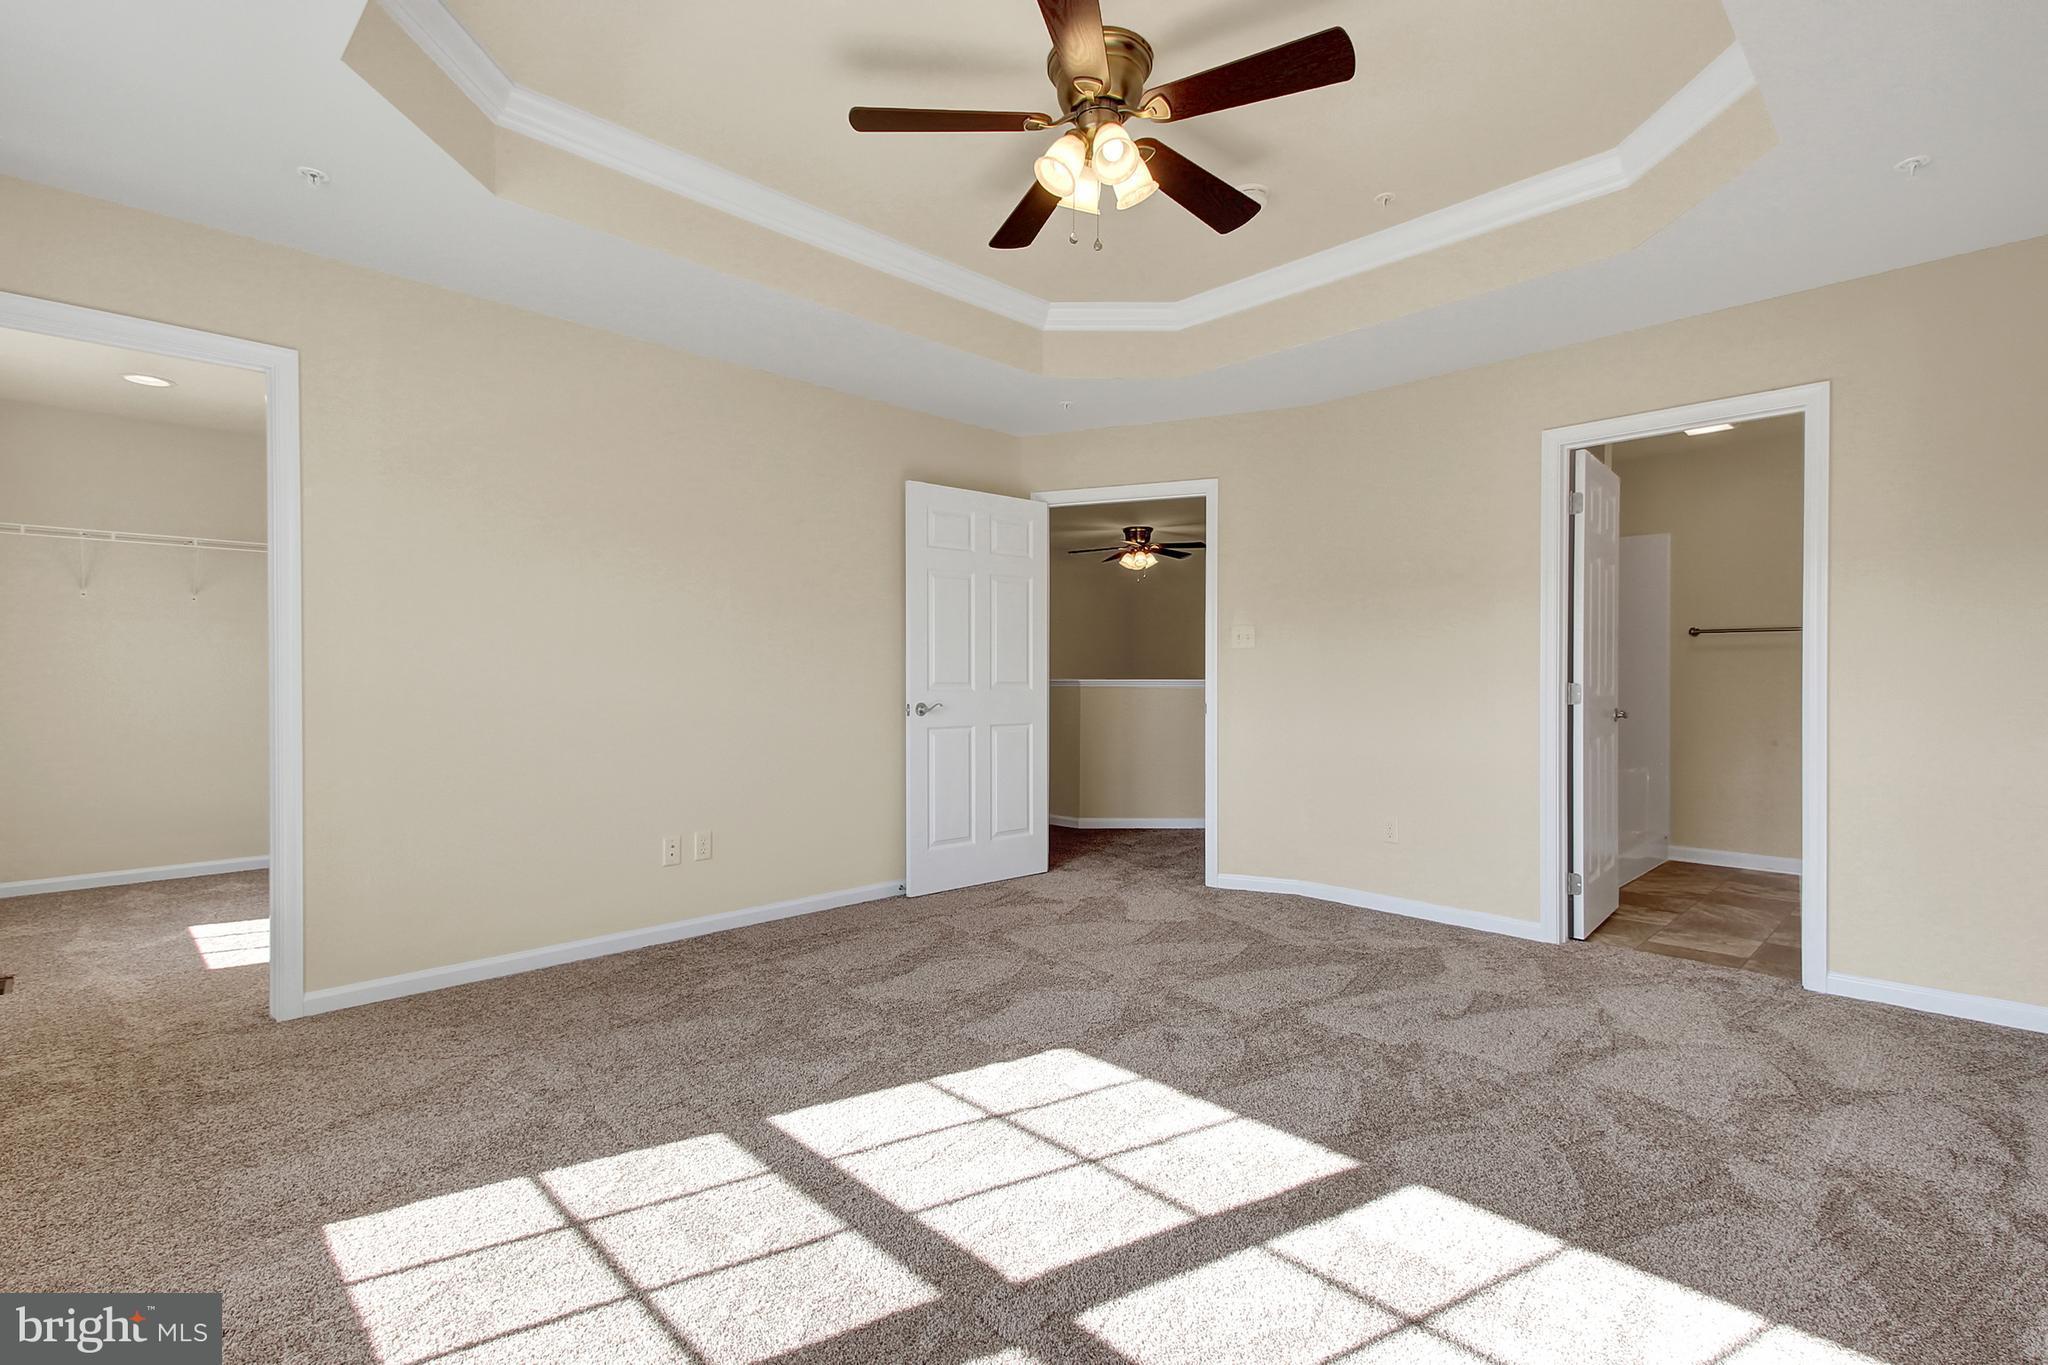 459 FRICK AVE, Waynesboro, PA 17268 $174,000 www.ronniemartinrealty ...